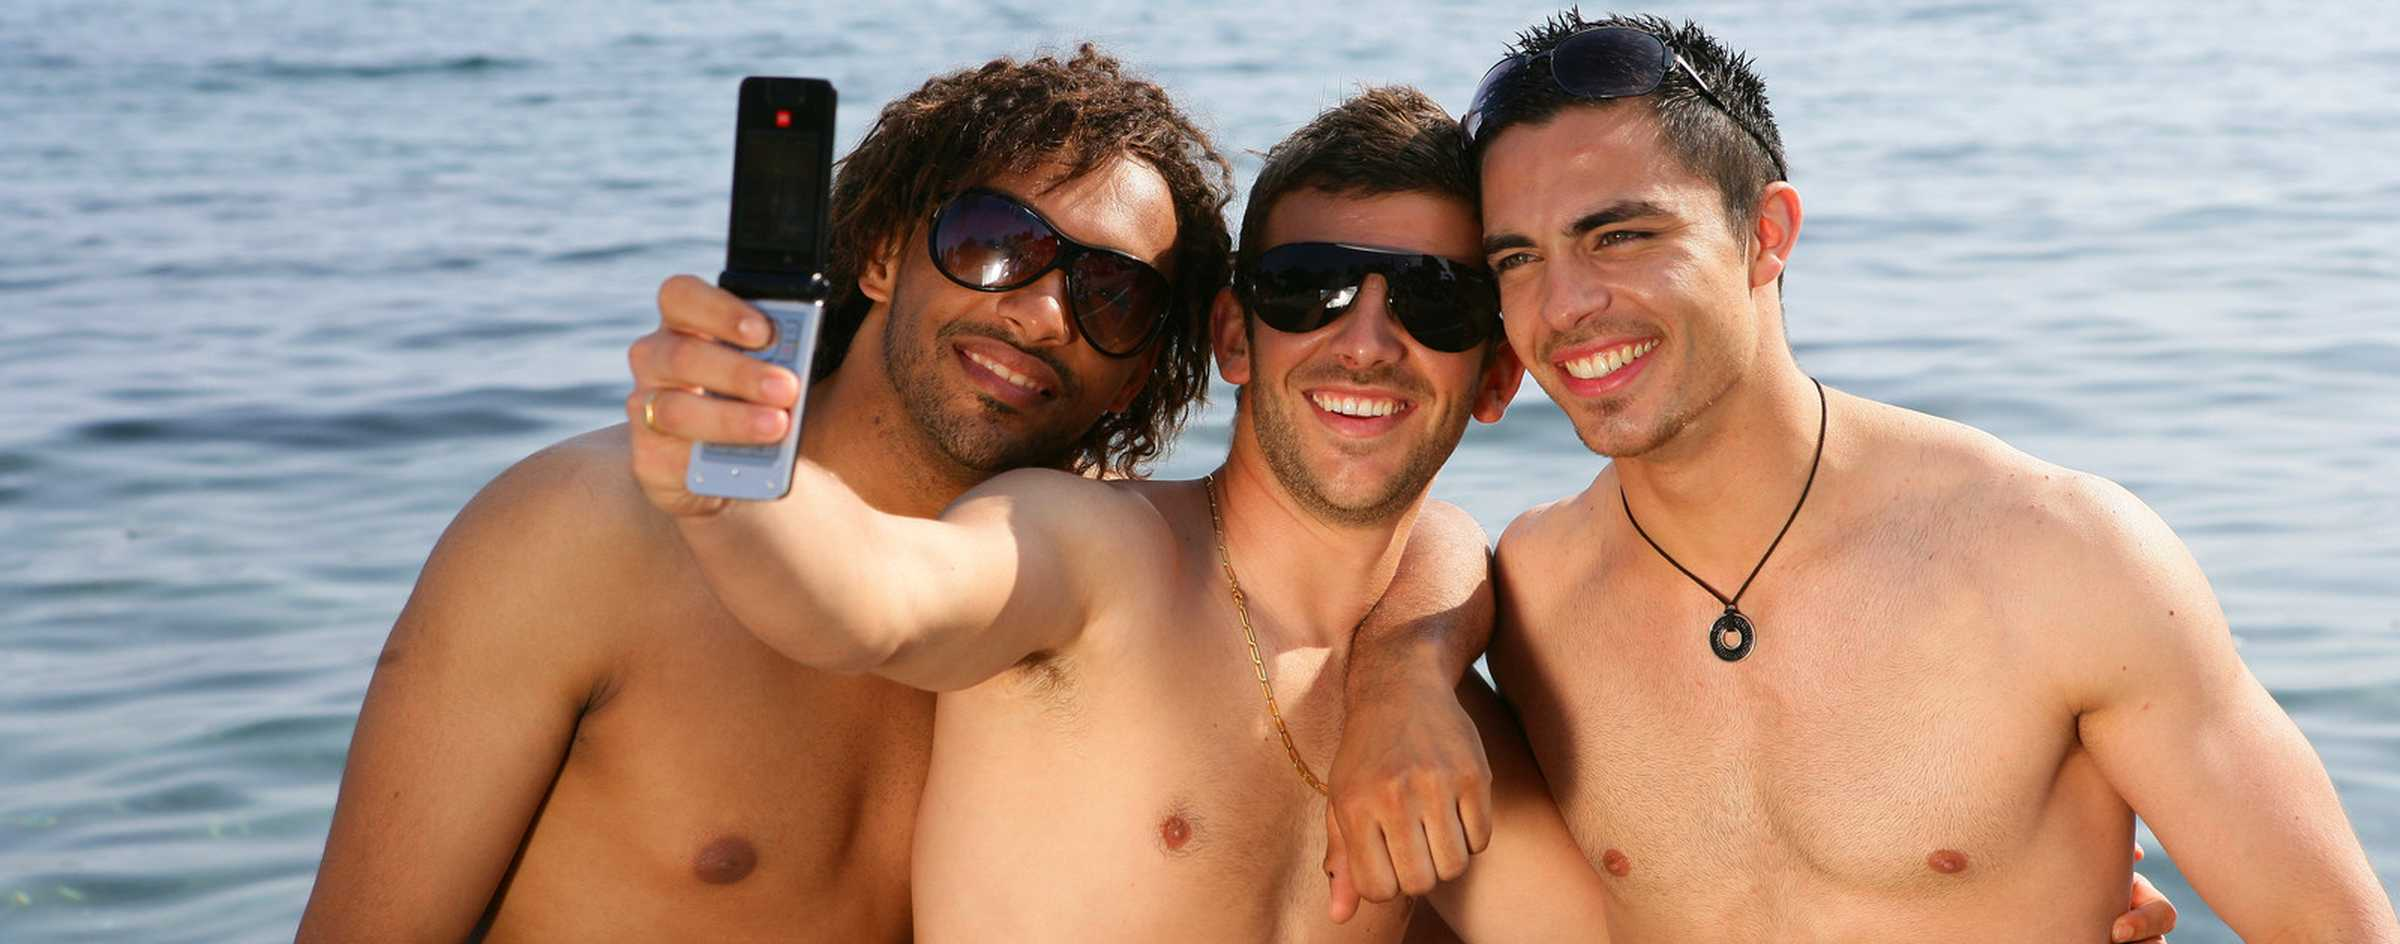 Gay Reise mit Gaytrotter